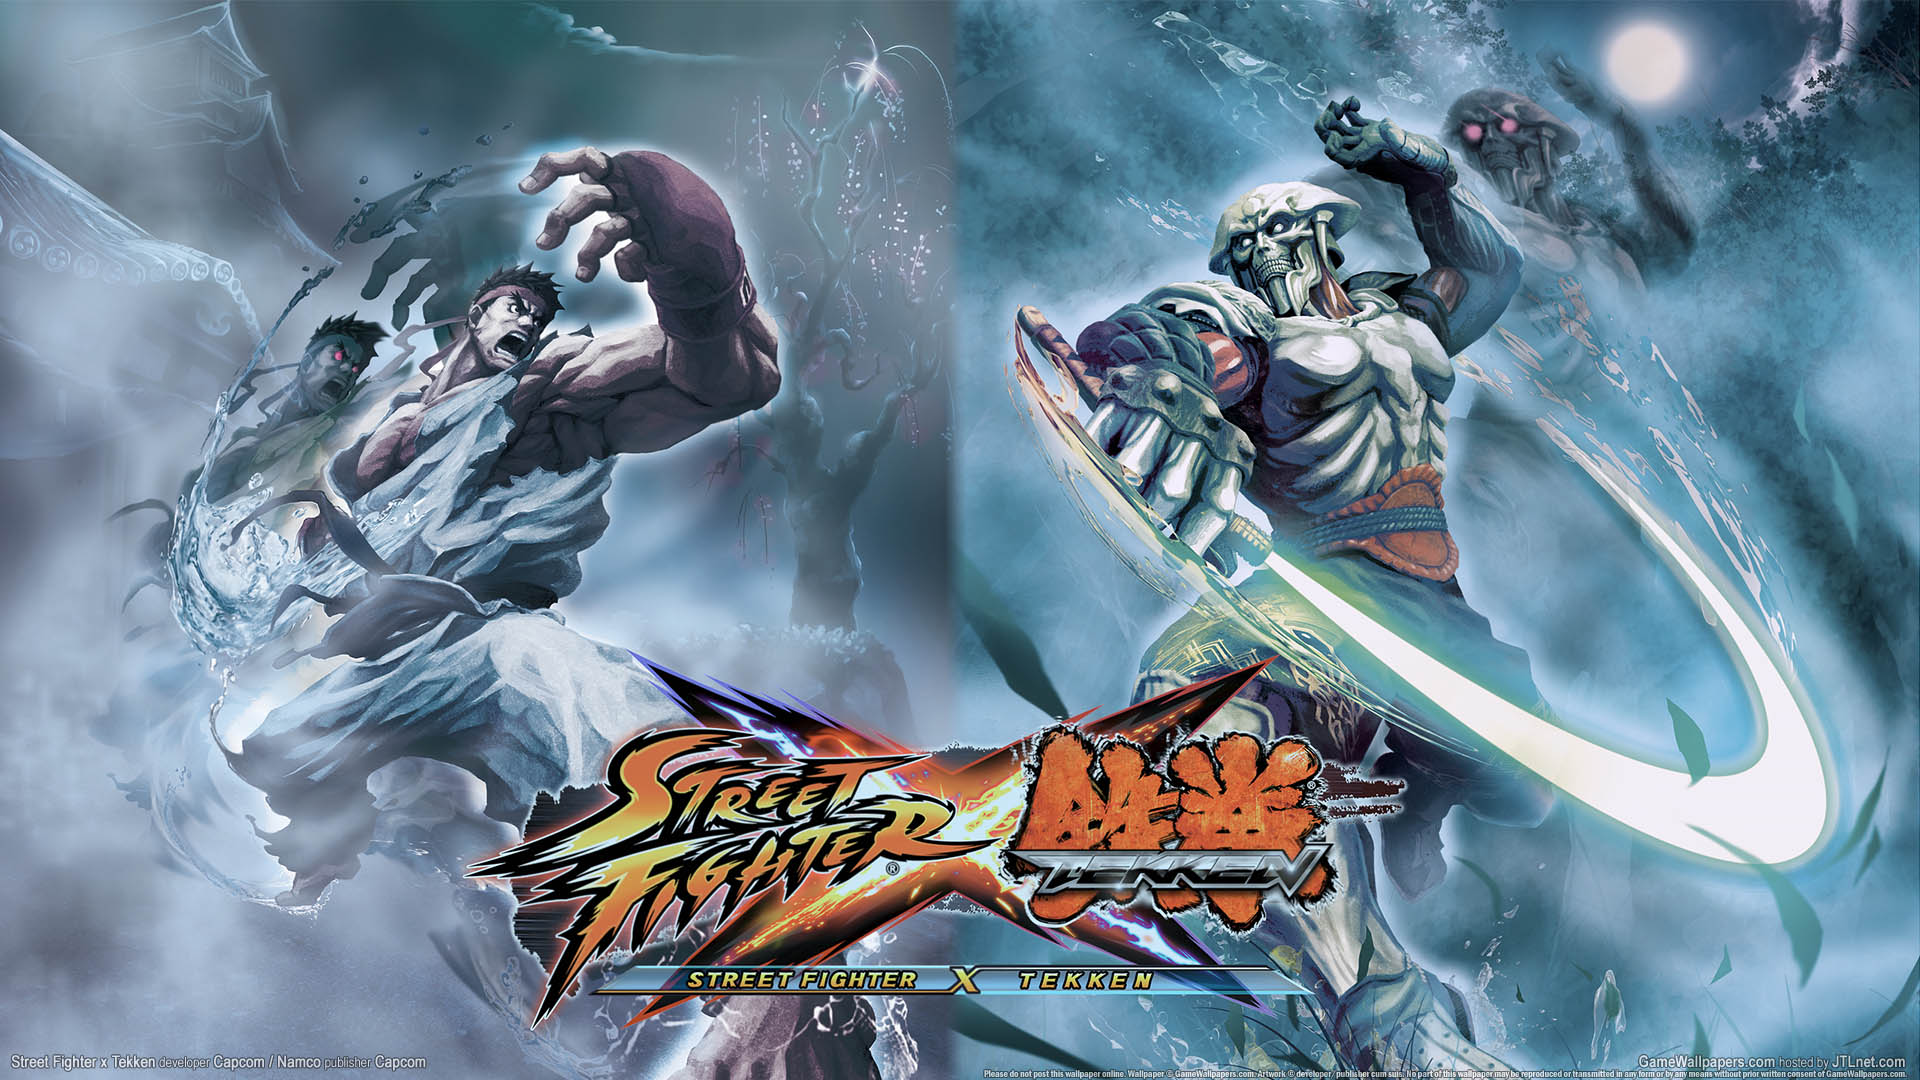 Street Fighter x Tekken wallpaper 03 1920x1080